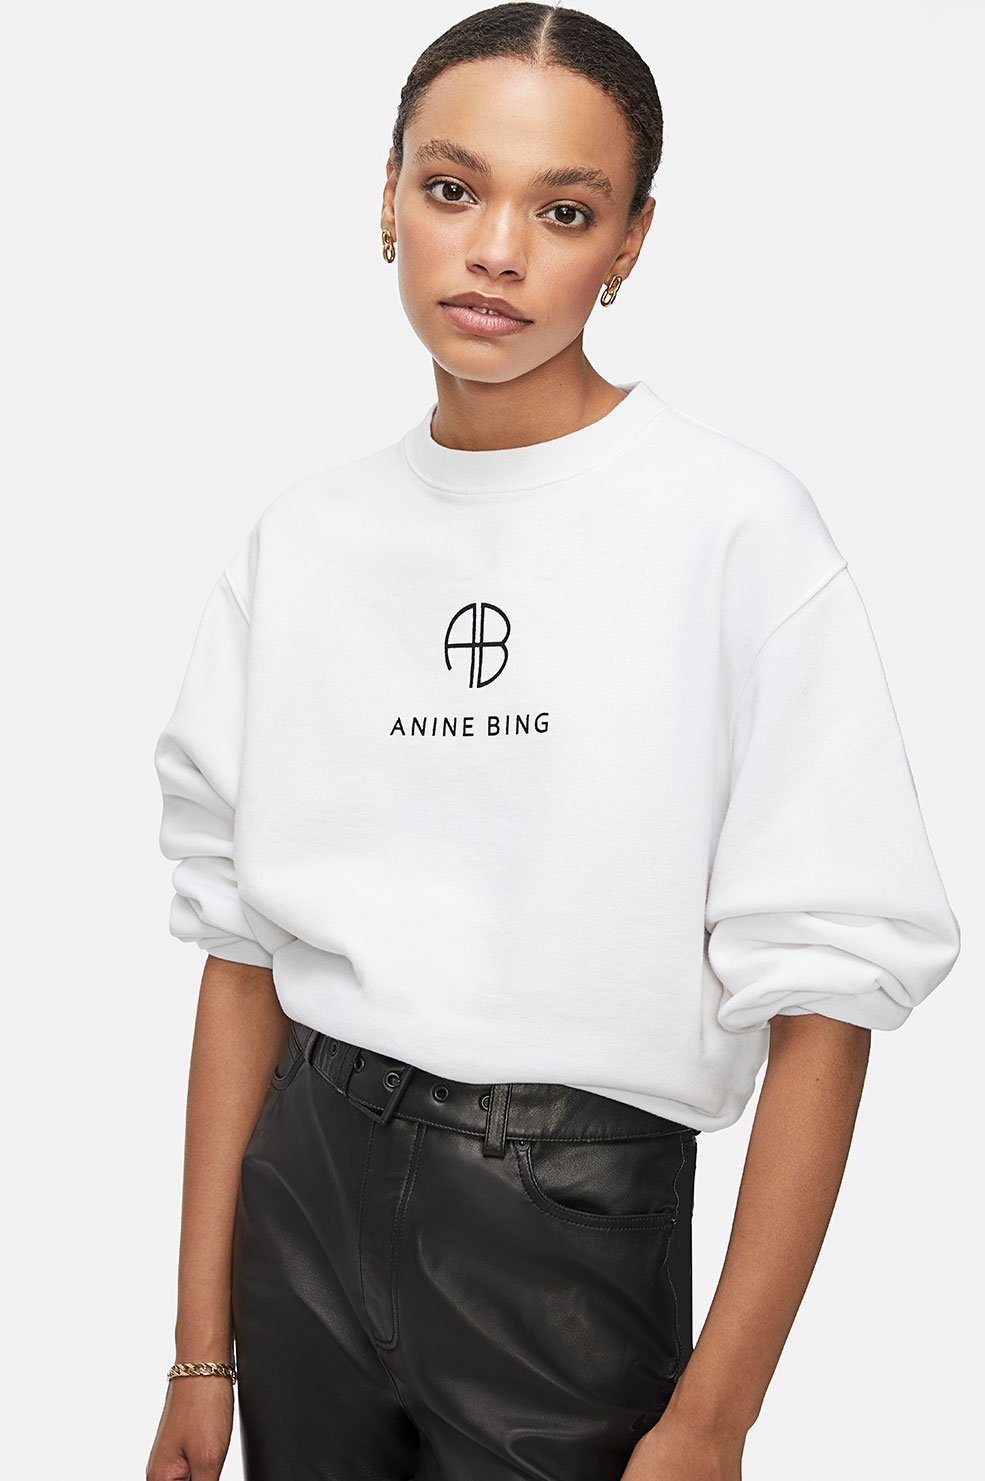 ANINE BING sweat monogram-2